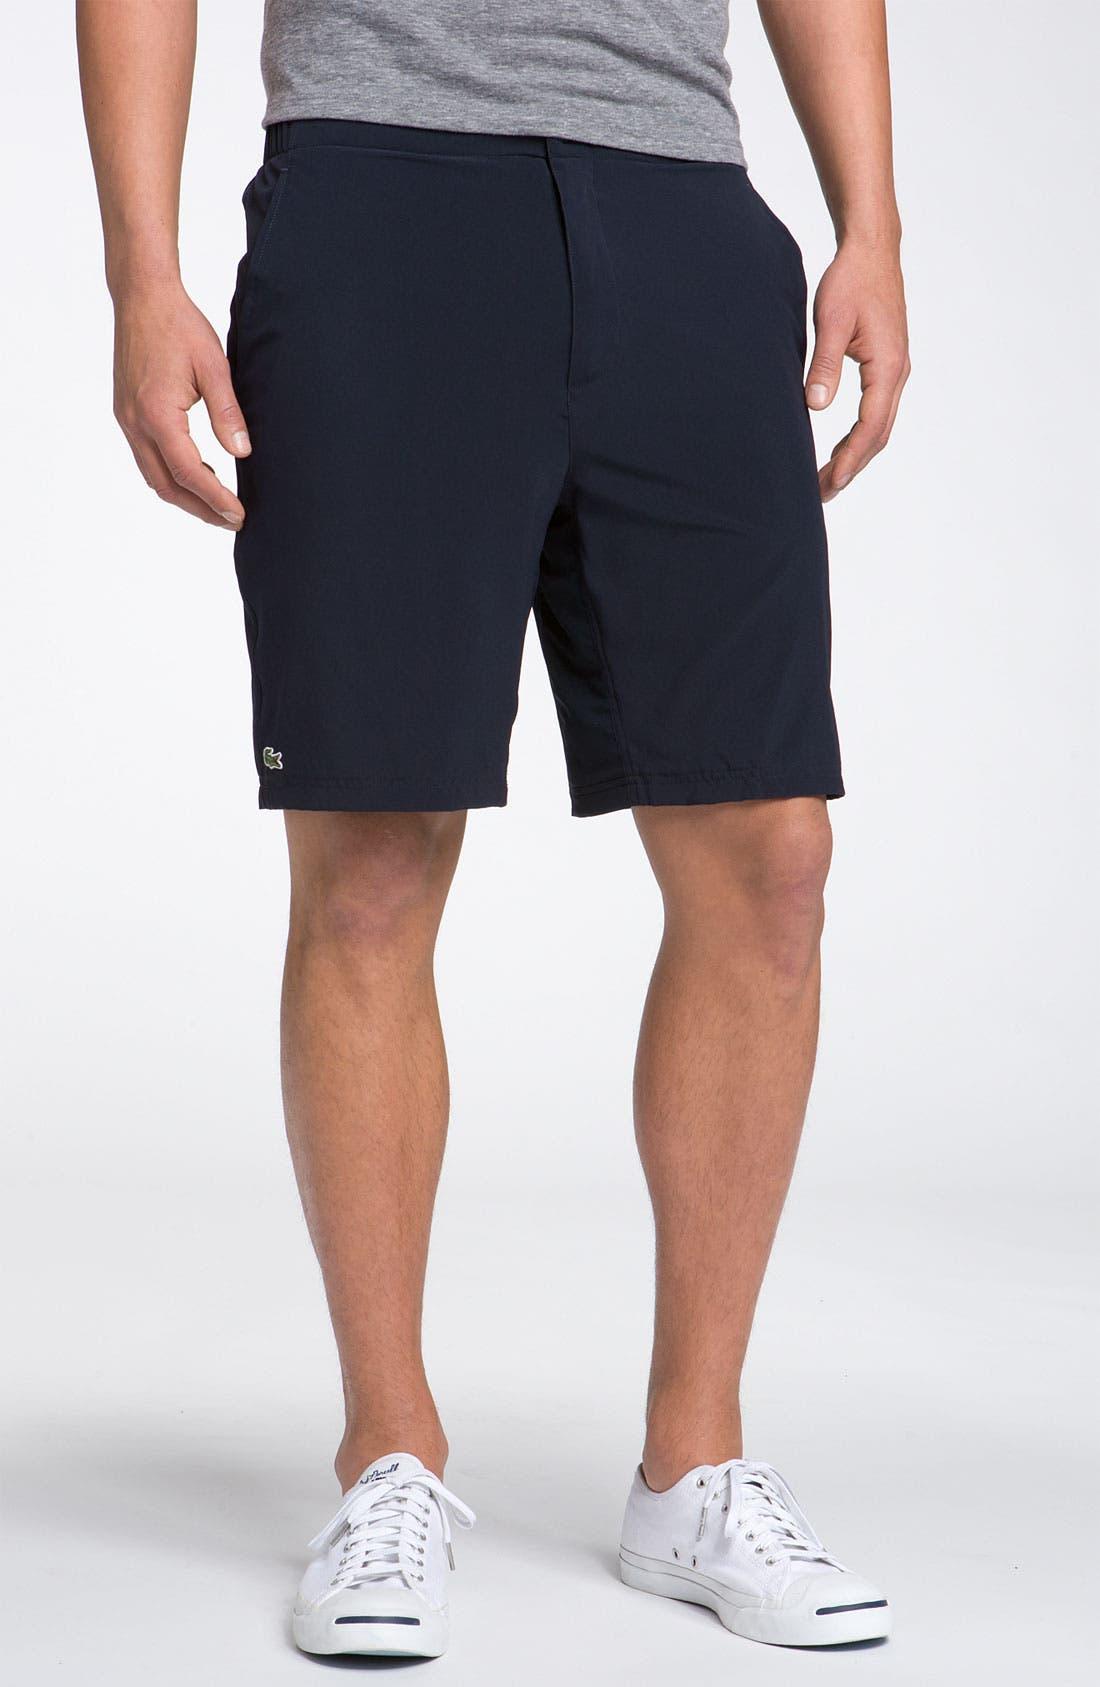 Main Image - Lacoste Taffeta Tennis Shorts